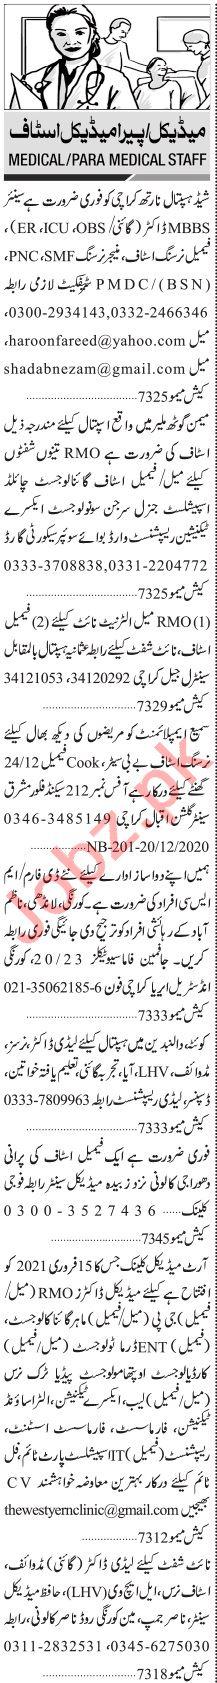 Jang Sunday Classified Ads 20 Dec 2020 Medical & Paramedical